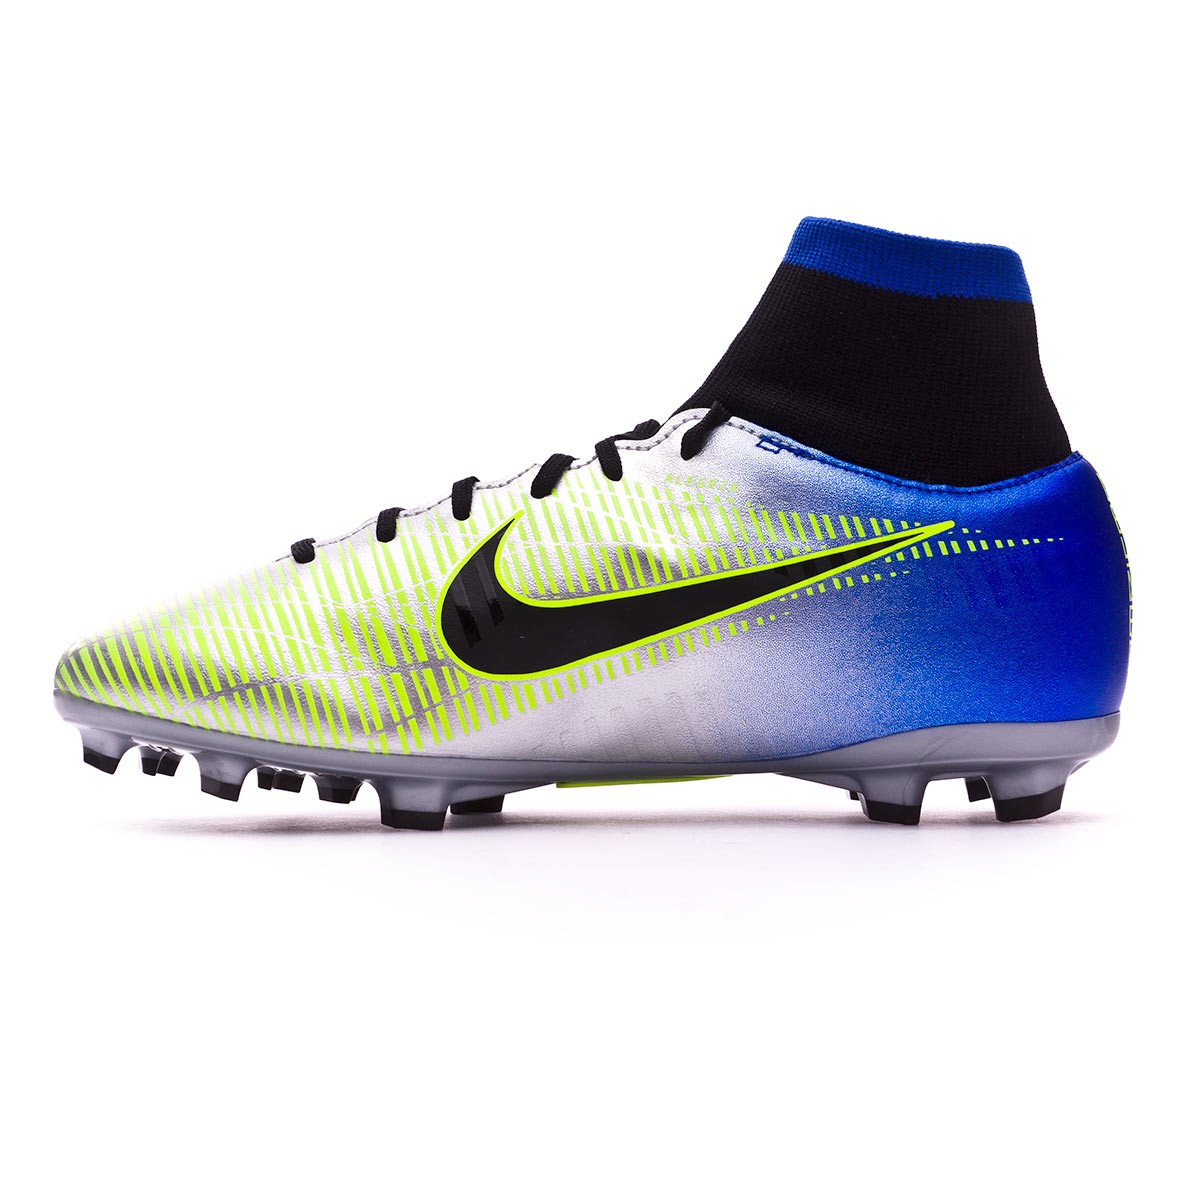 Zapatos de fútbol Nike Mercurial Victory VI DF FG Neymar Niño Racer  blue-Black-Chrome-Volt - Soloporteros es ahora Fútbol Emotion afc99638316f8